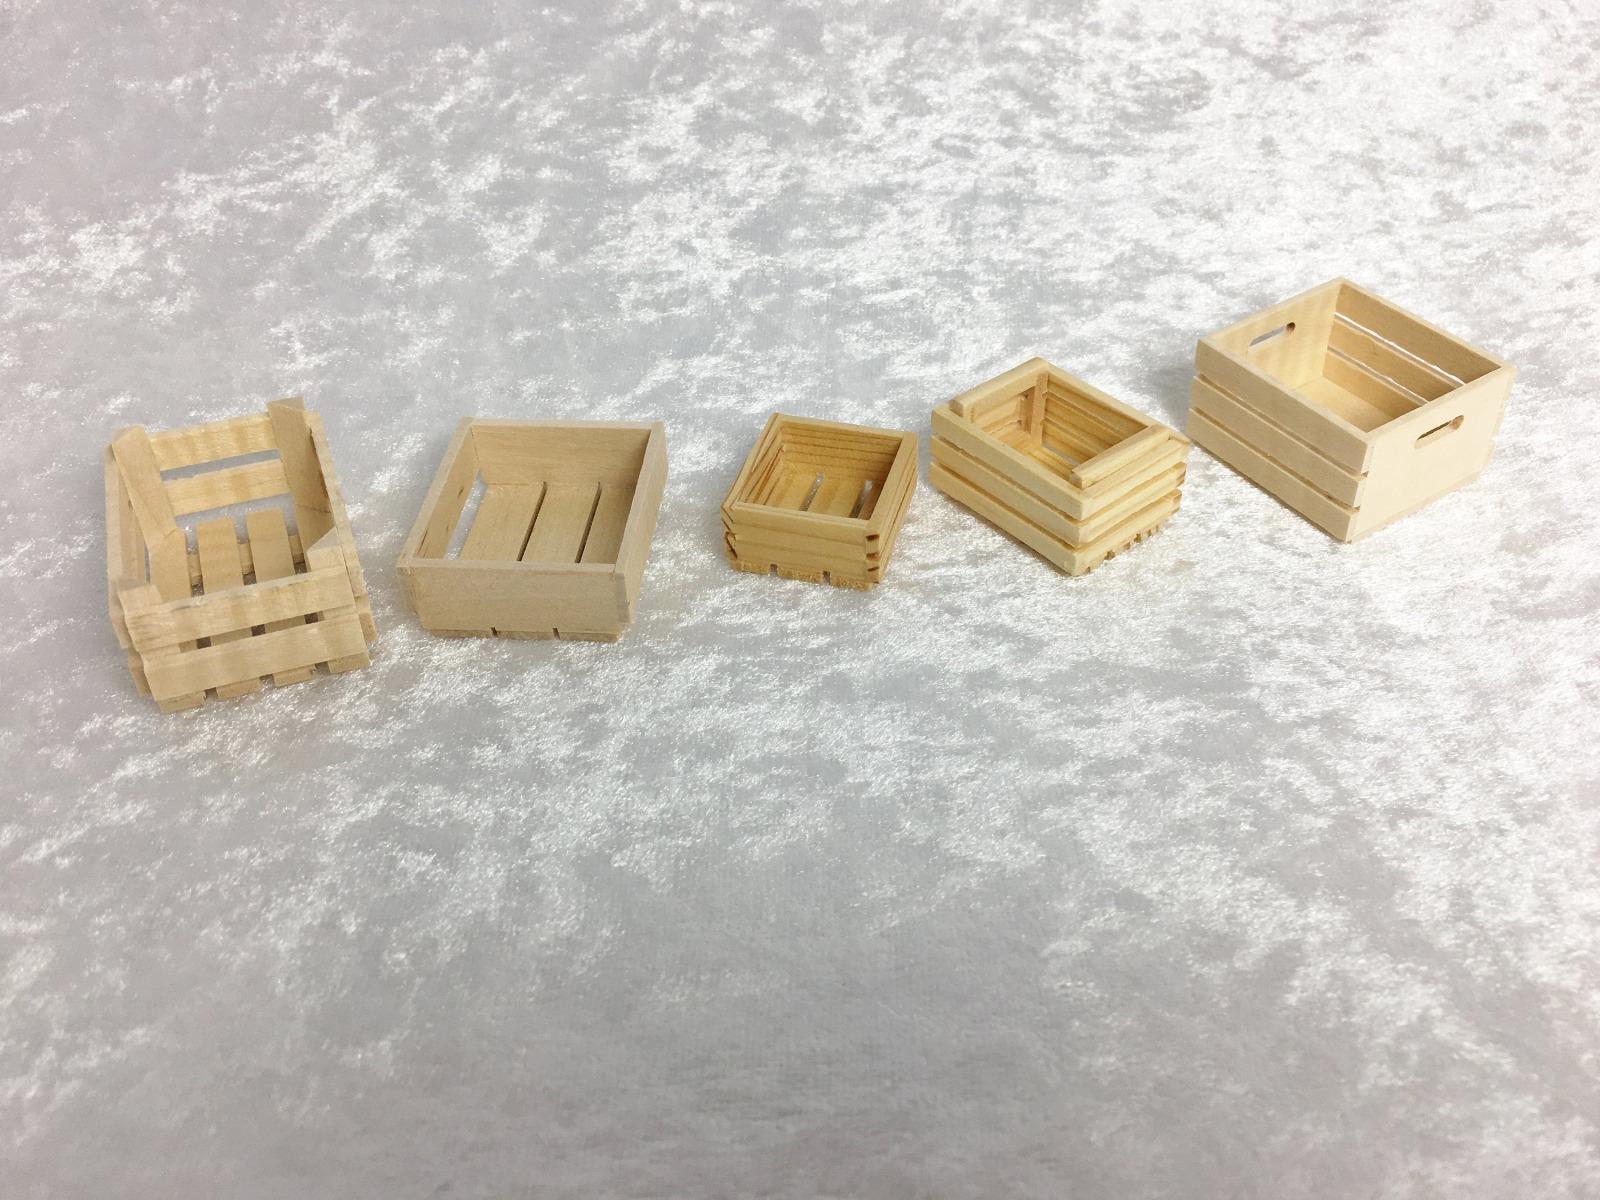 Gemüsekiste aus Holz Holzkiste Kiste für